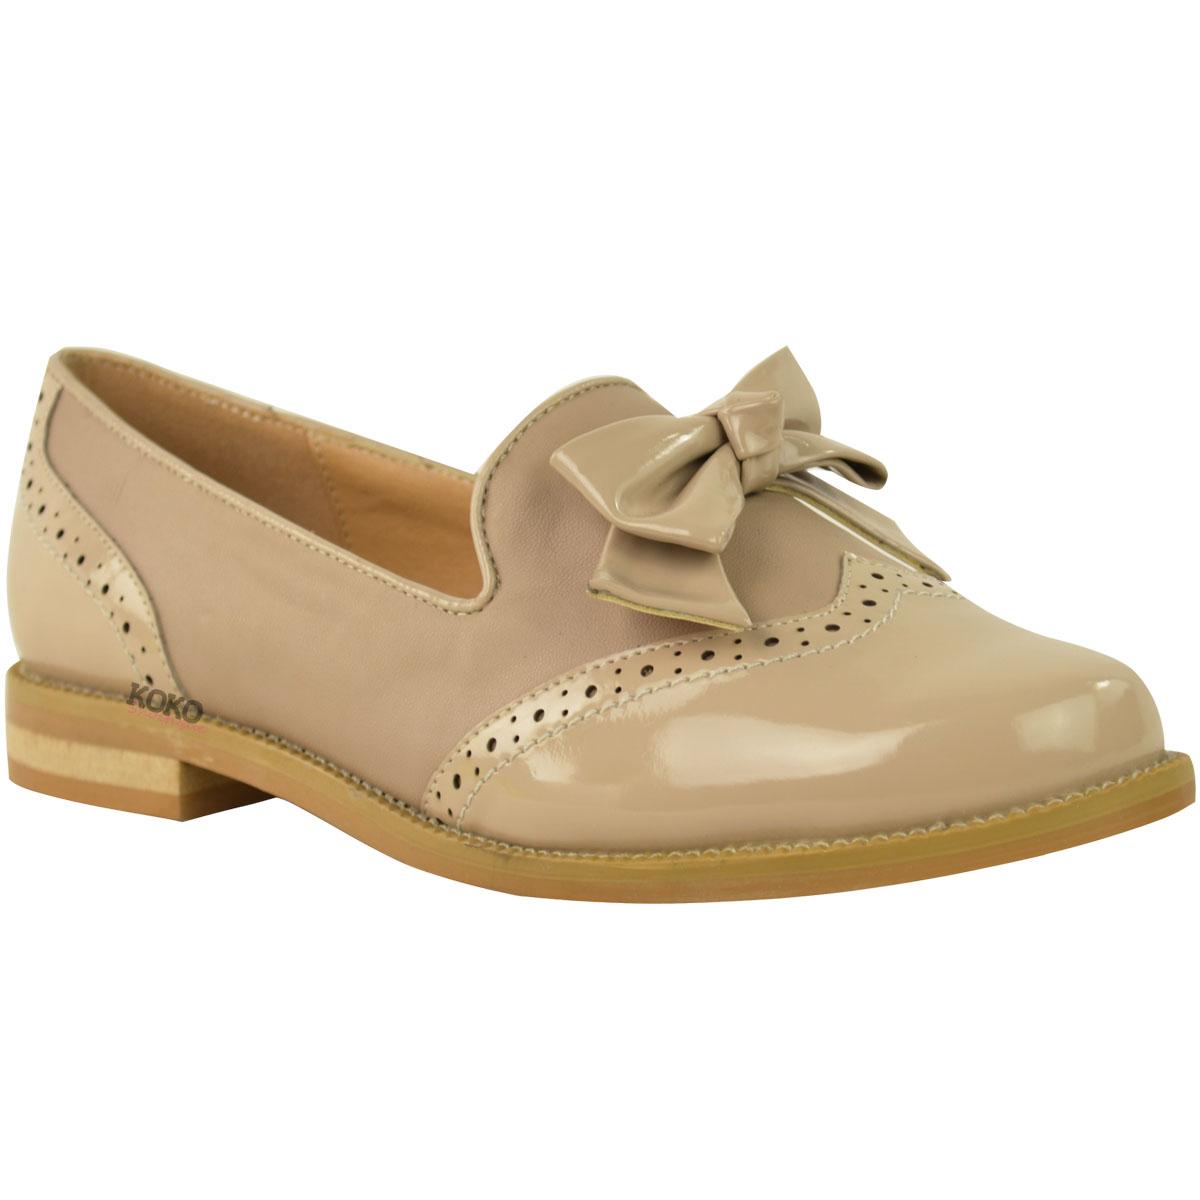 Office Shoes Womens Pumps